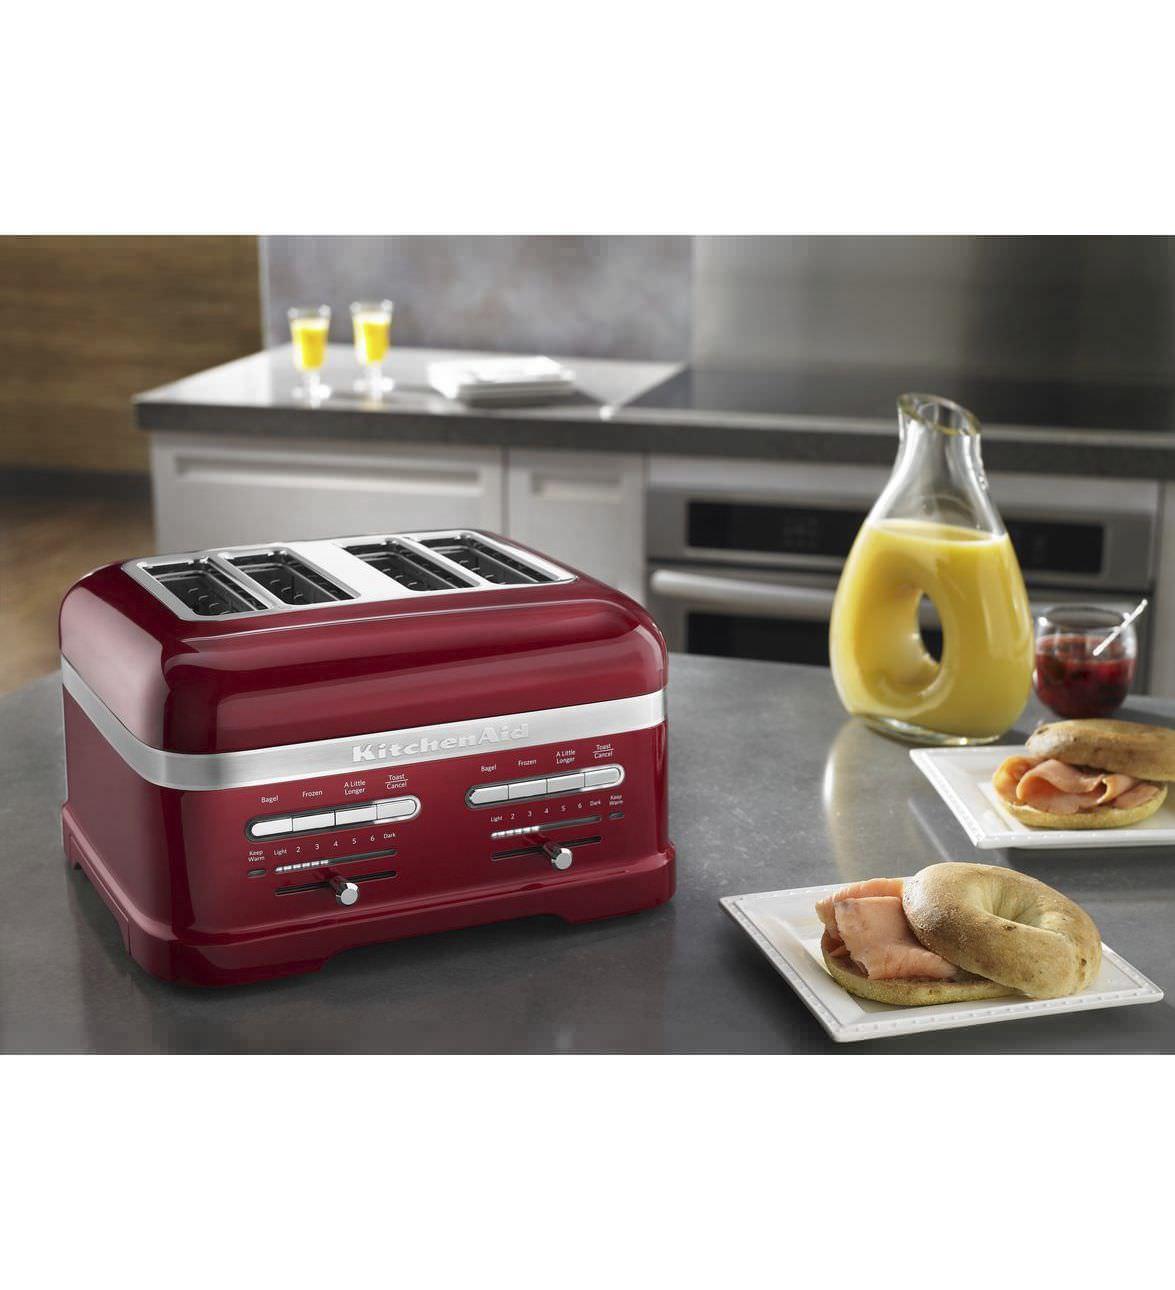 4 slice toaster KMT4203 KitchenAid